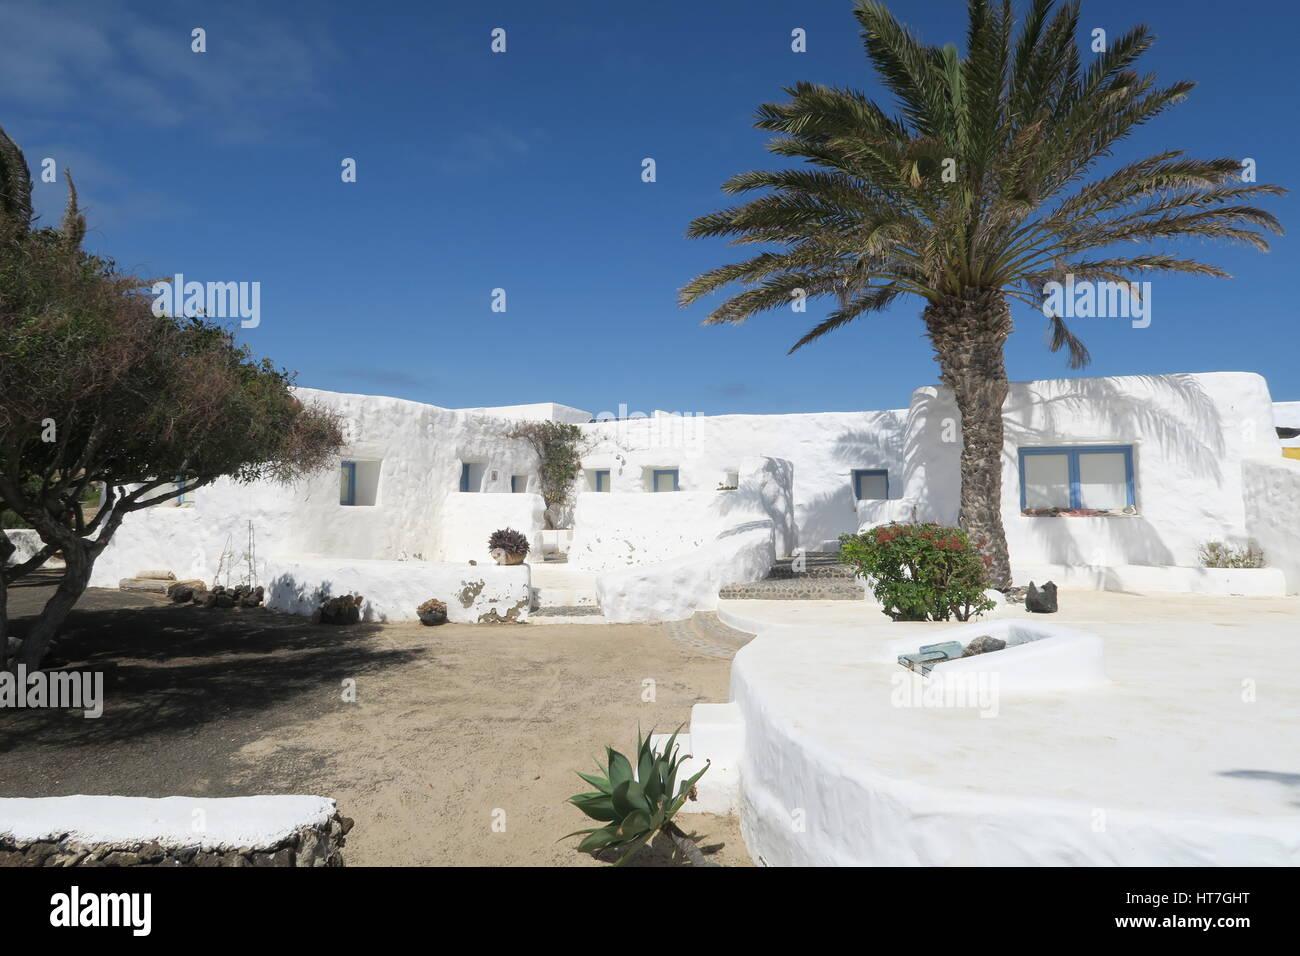 Houses at Pedro Barba - Stock Image